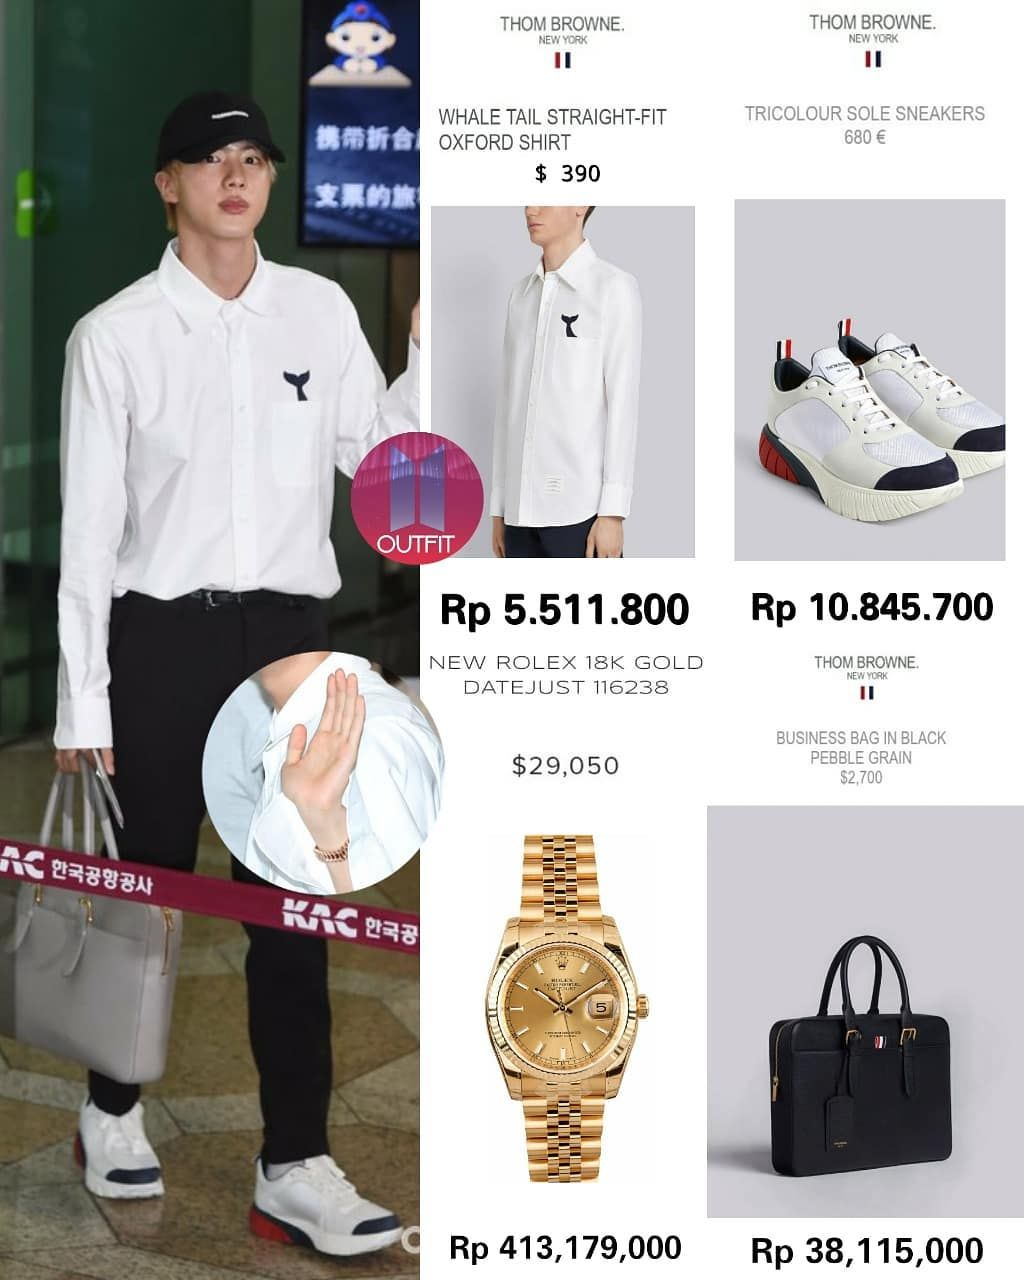 Bts Outfit Fashion Related Di Instagram Gue Heran Kenapa Seokjin Pake Nya Yang Murah Murah Mulu Bts Clothing Bts Inspired Outfits Korean Fashion Men